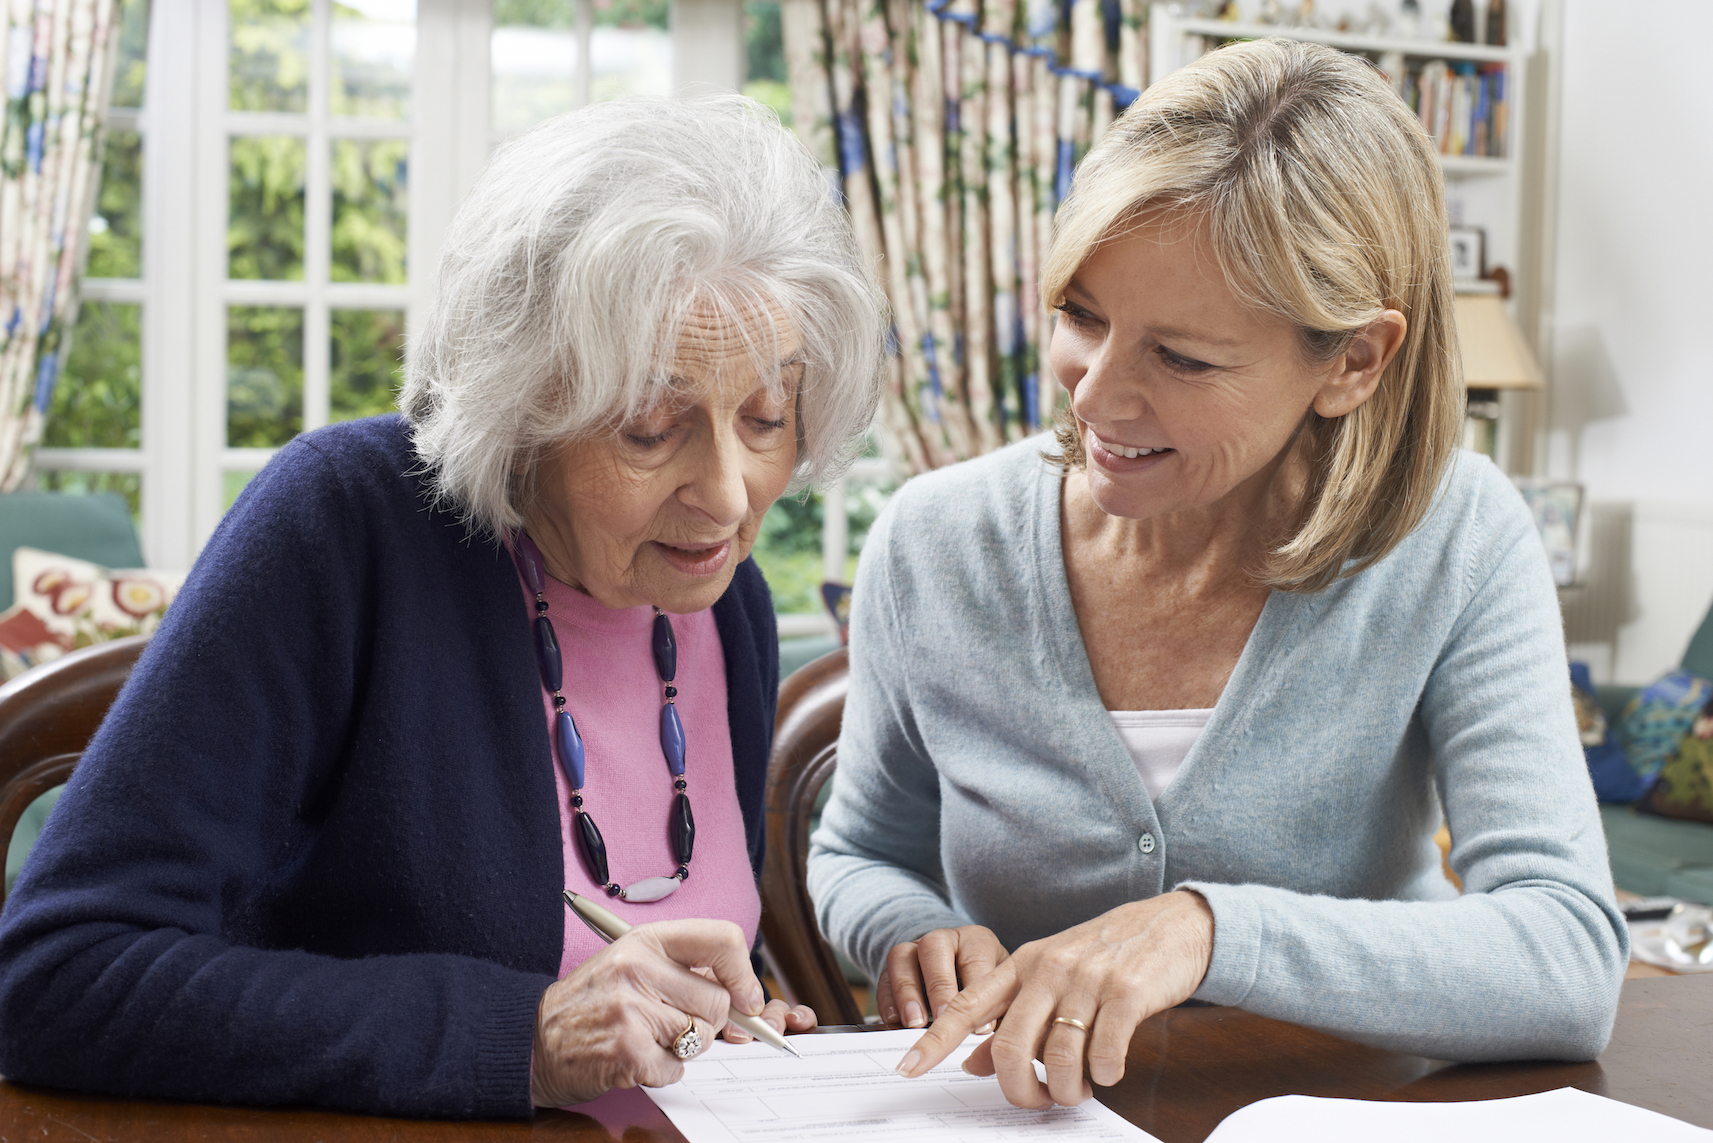 Elder Care Advisors Helping People Age Well